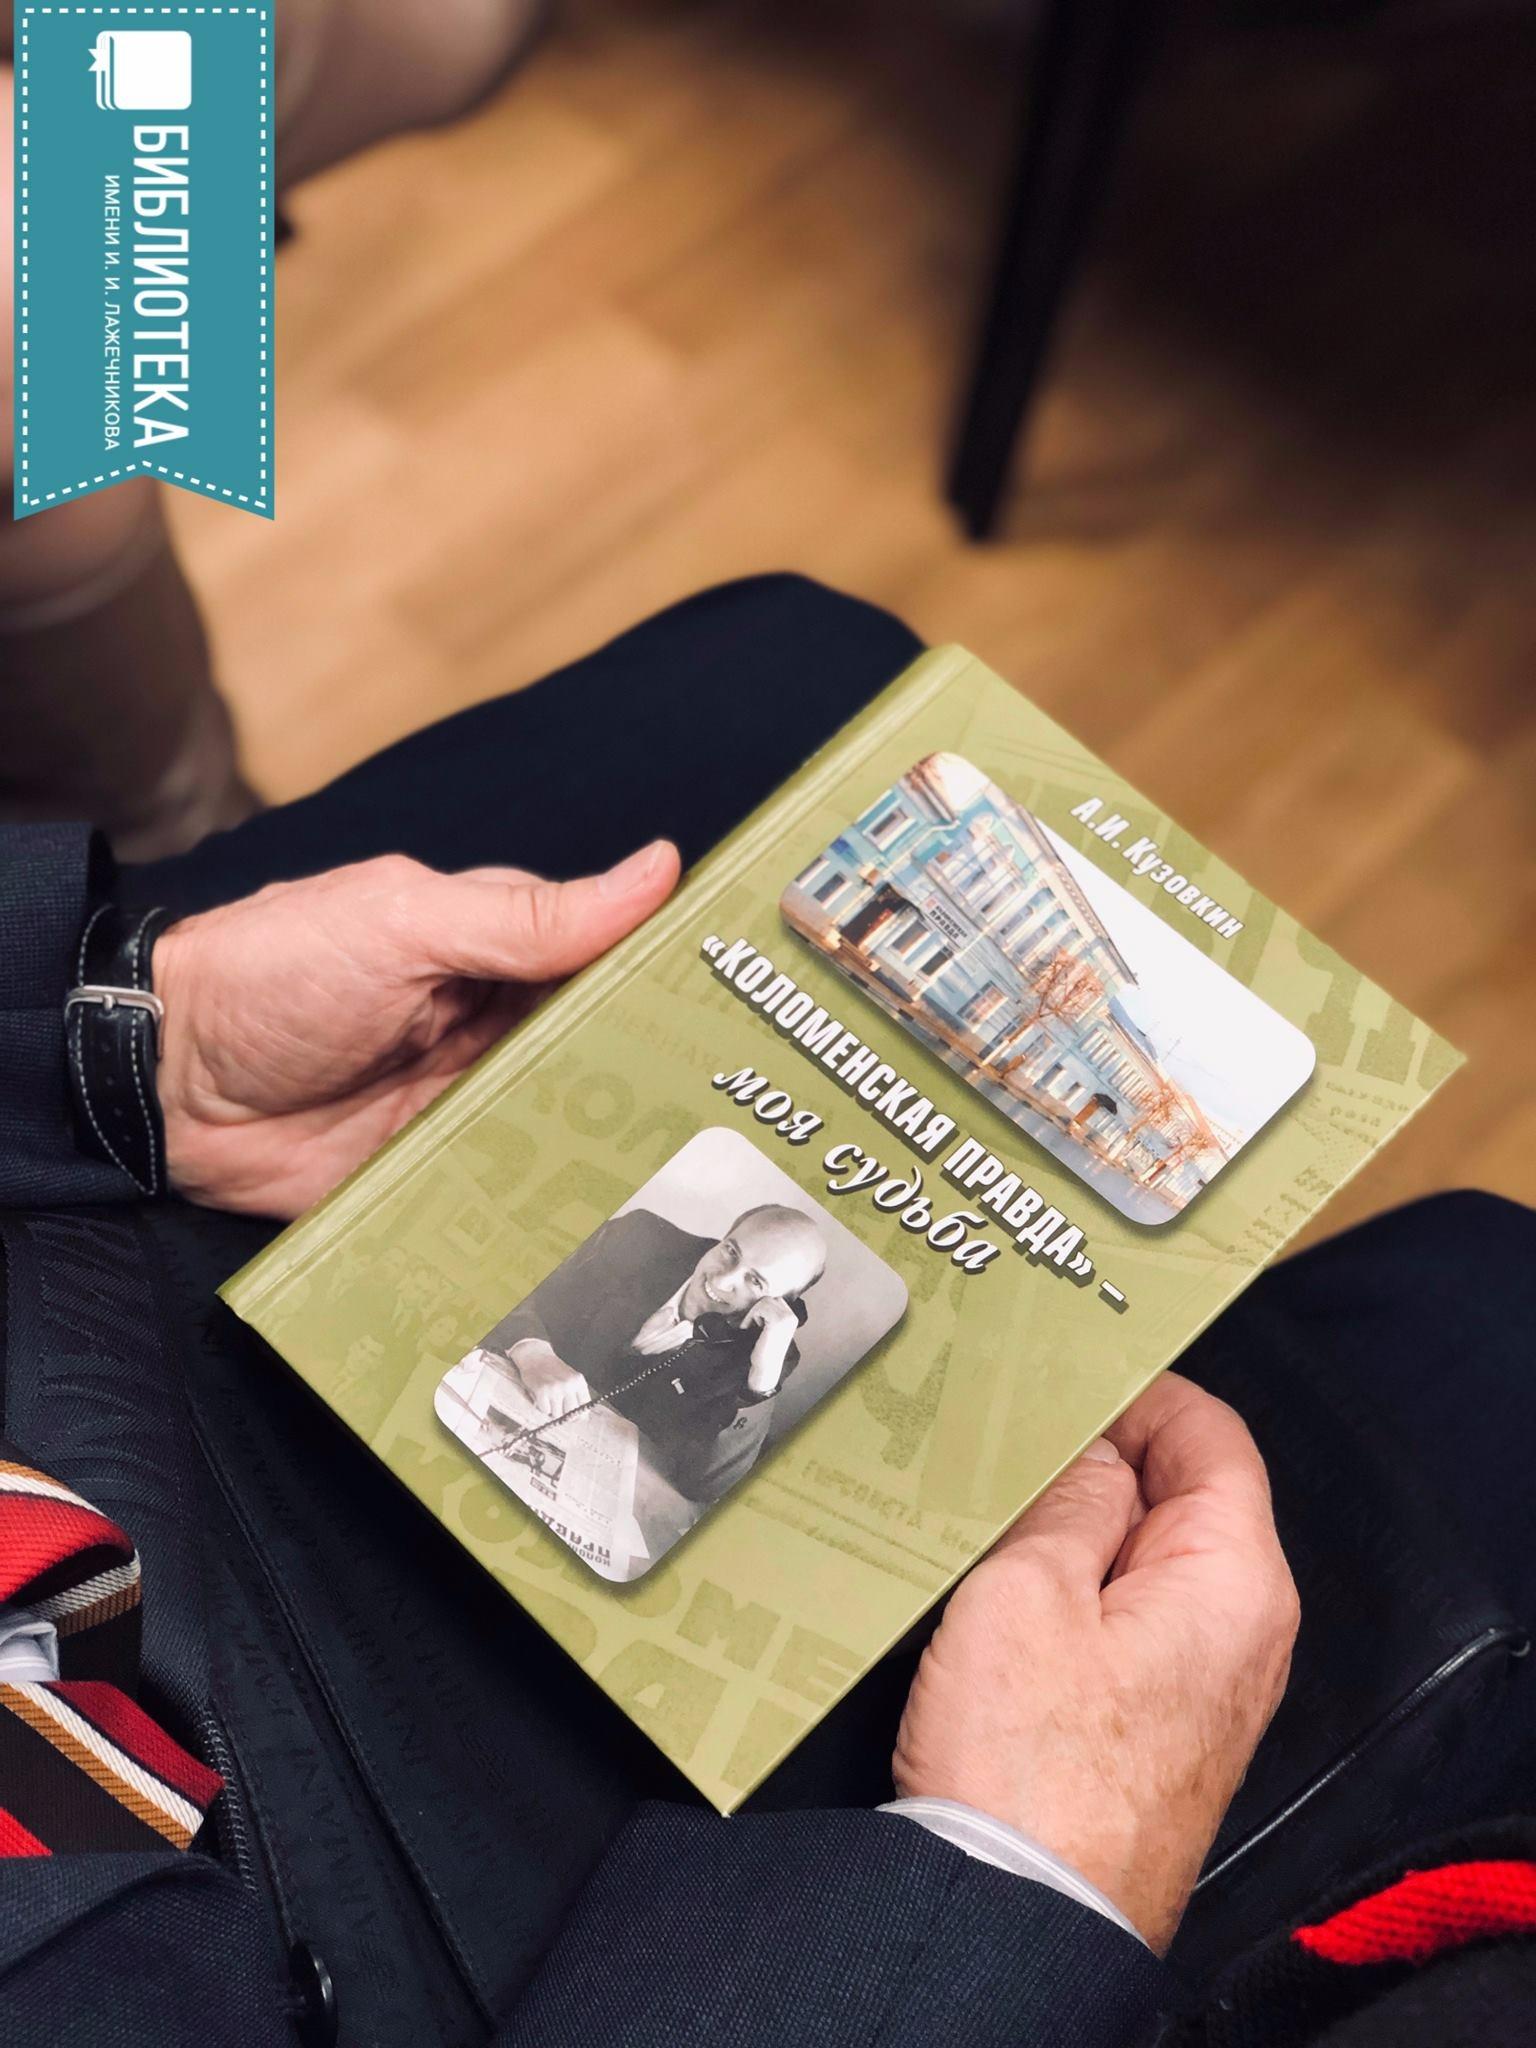 Коломенский краевед представил свою новую книгу